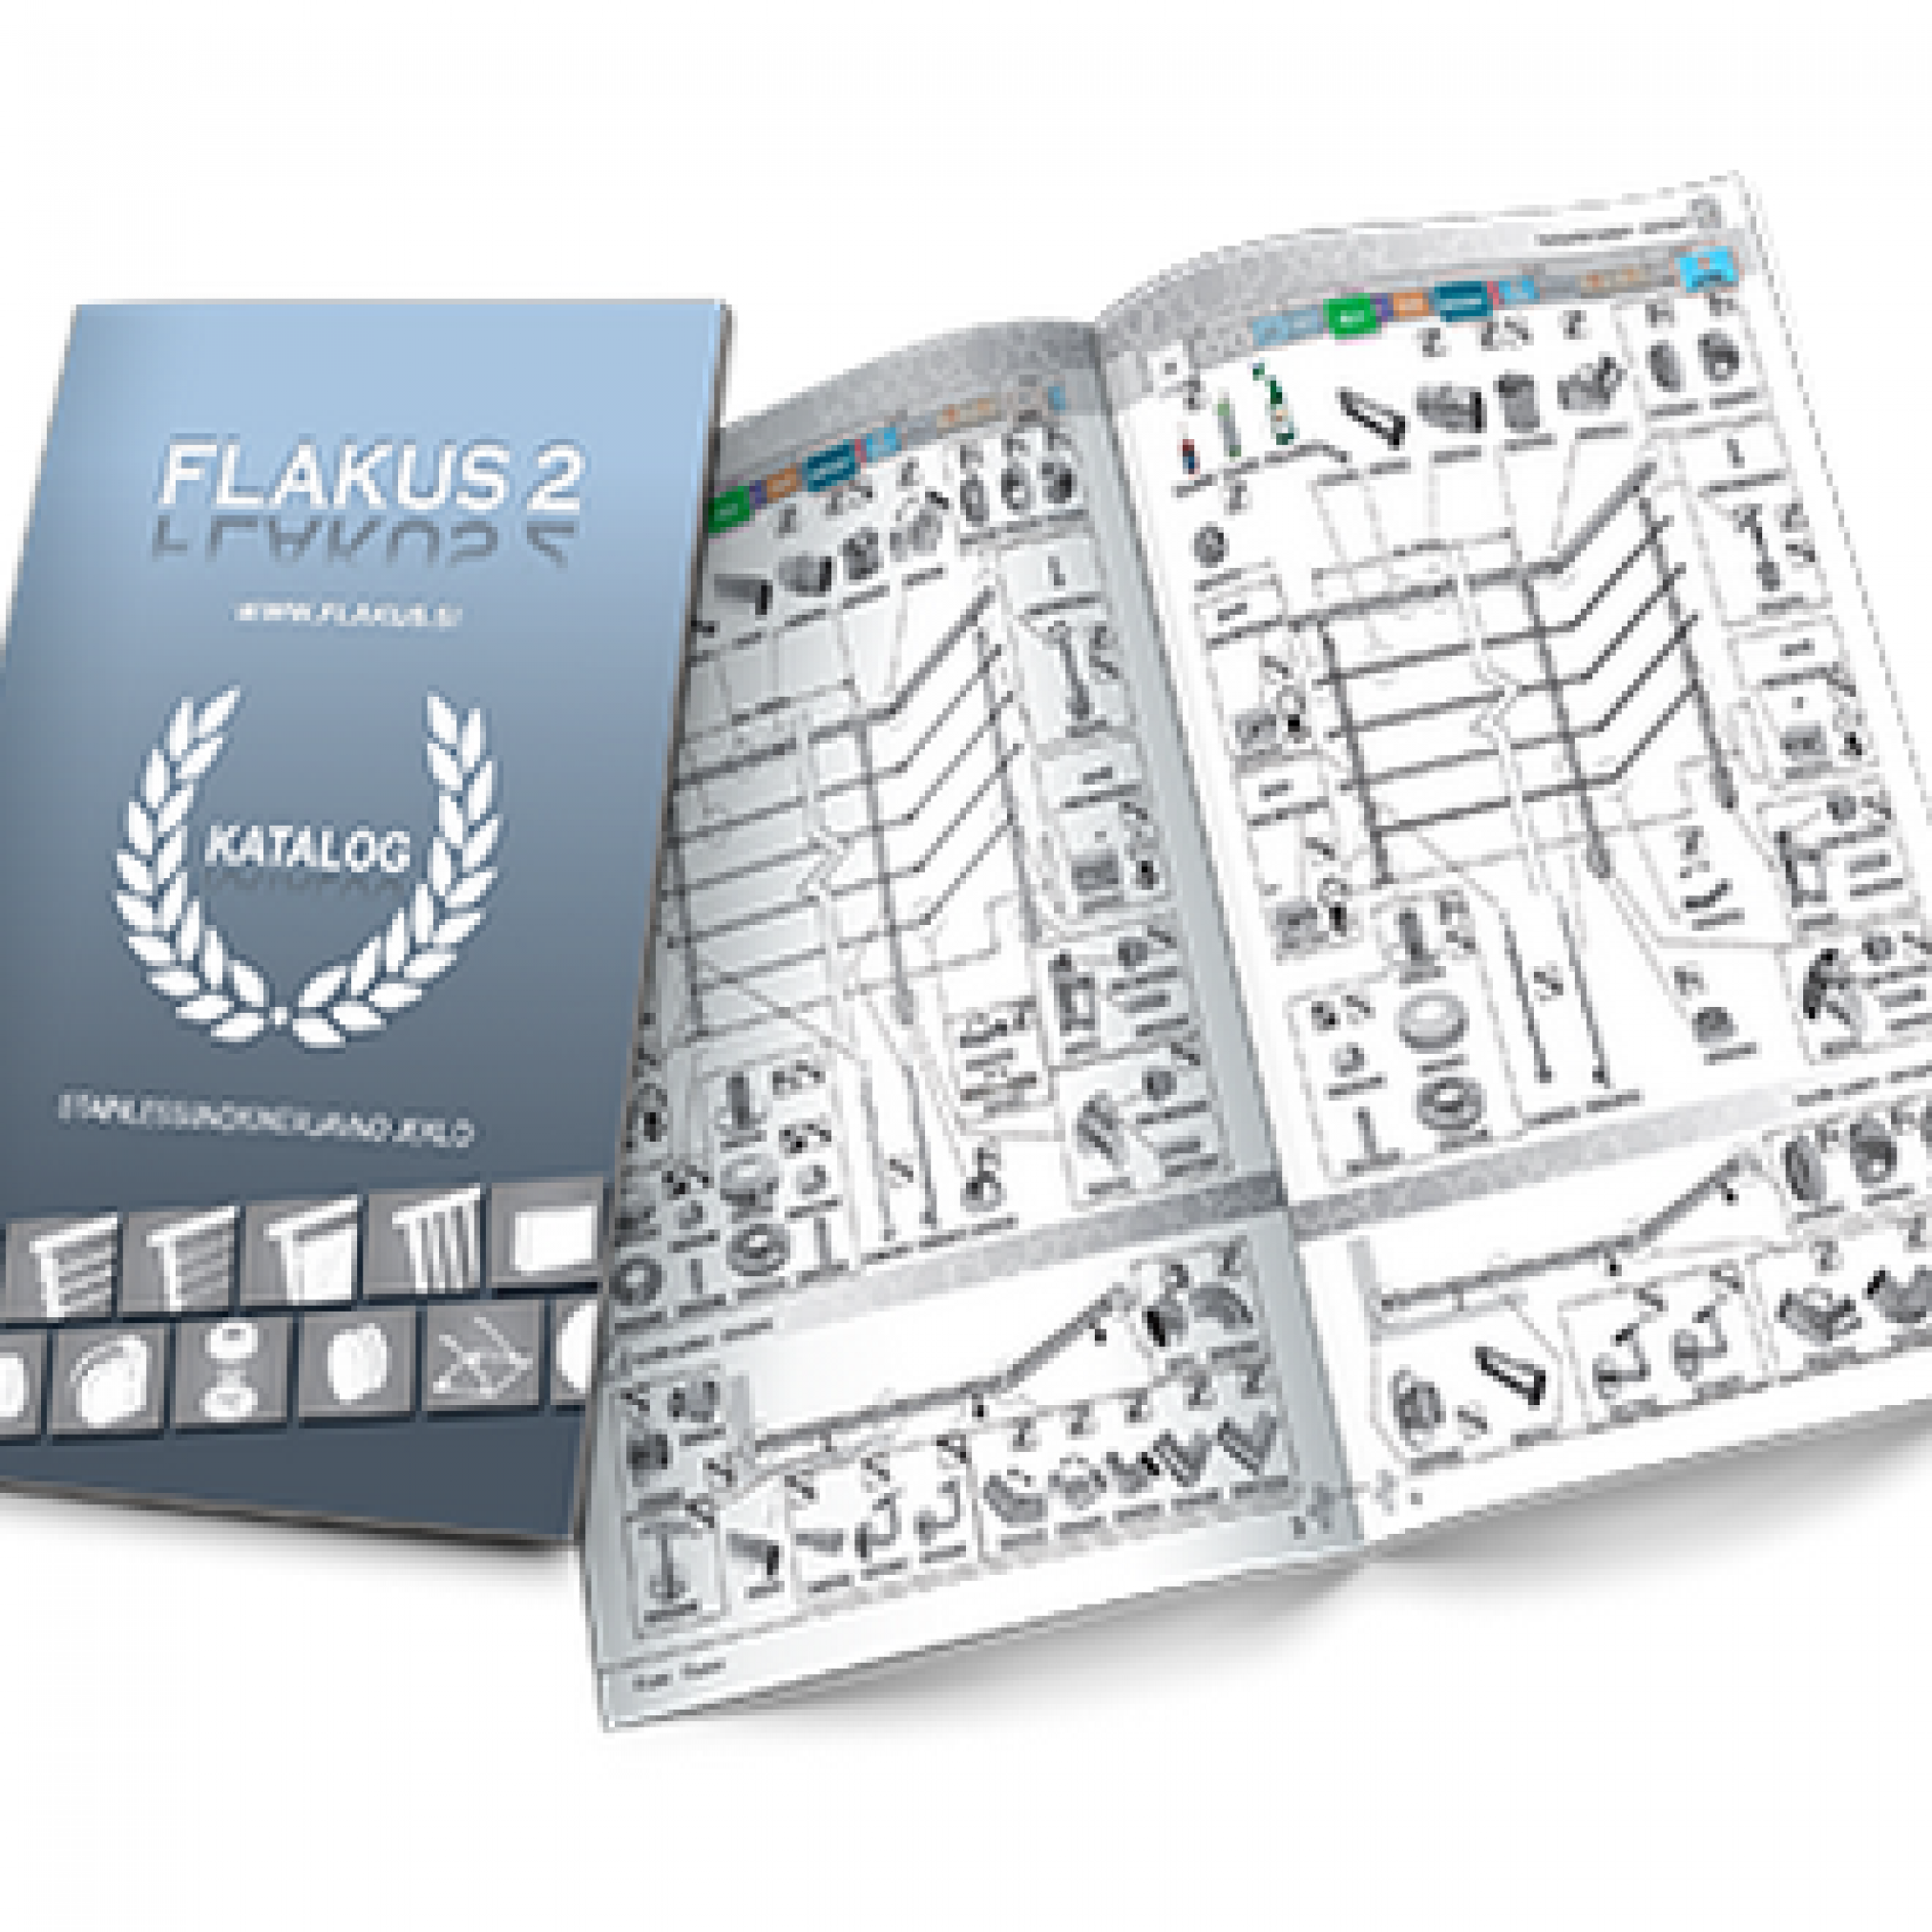 Flakus2-katalog-inox-rostfrei